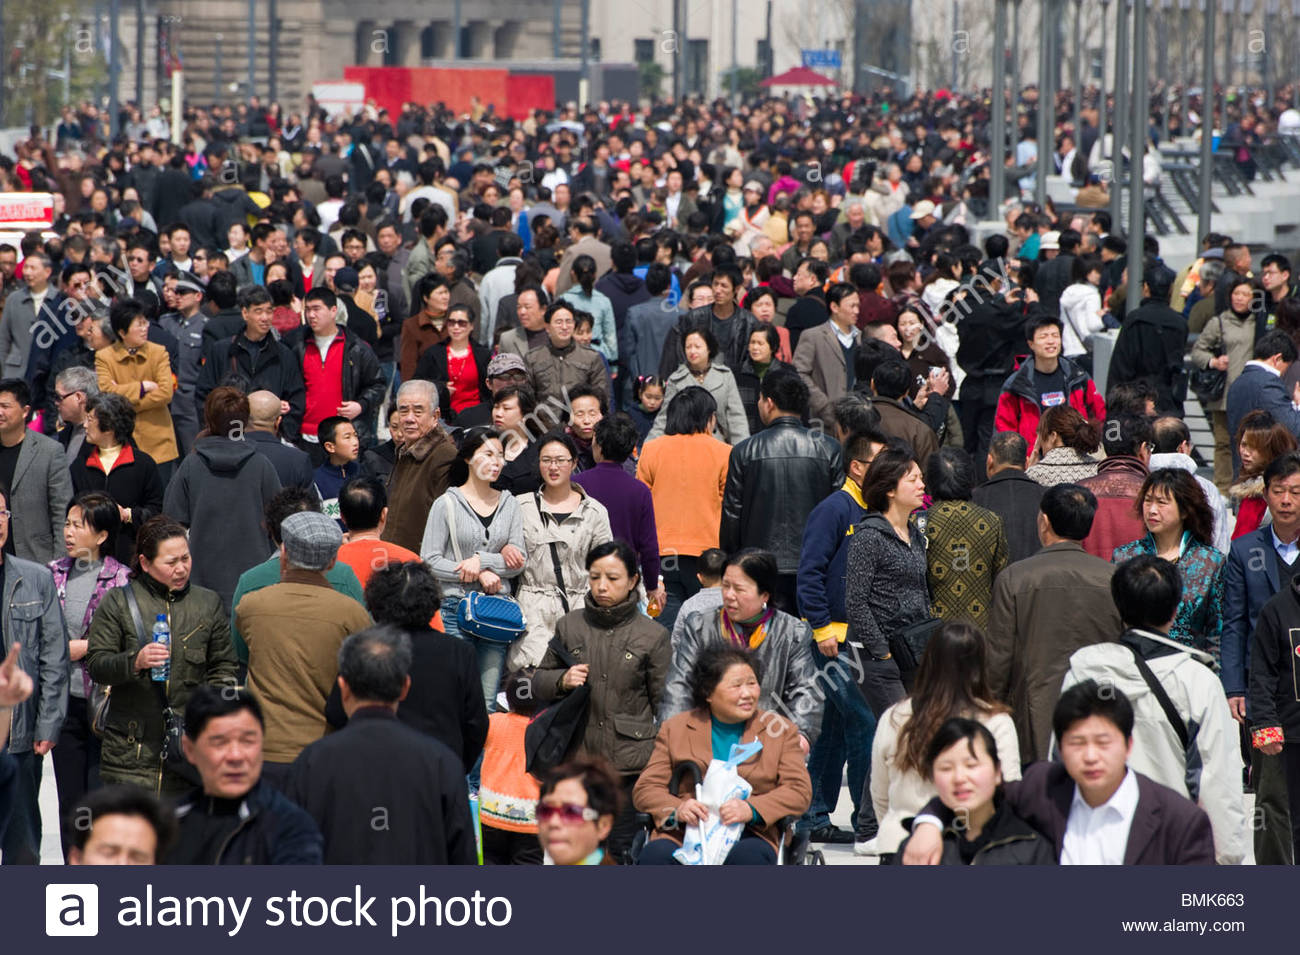 Crowds walking along the Bund, Shanghai, China - Stock Image